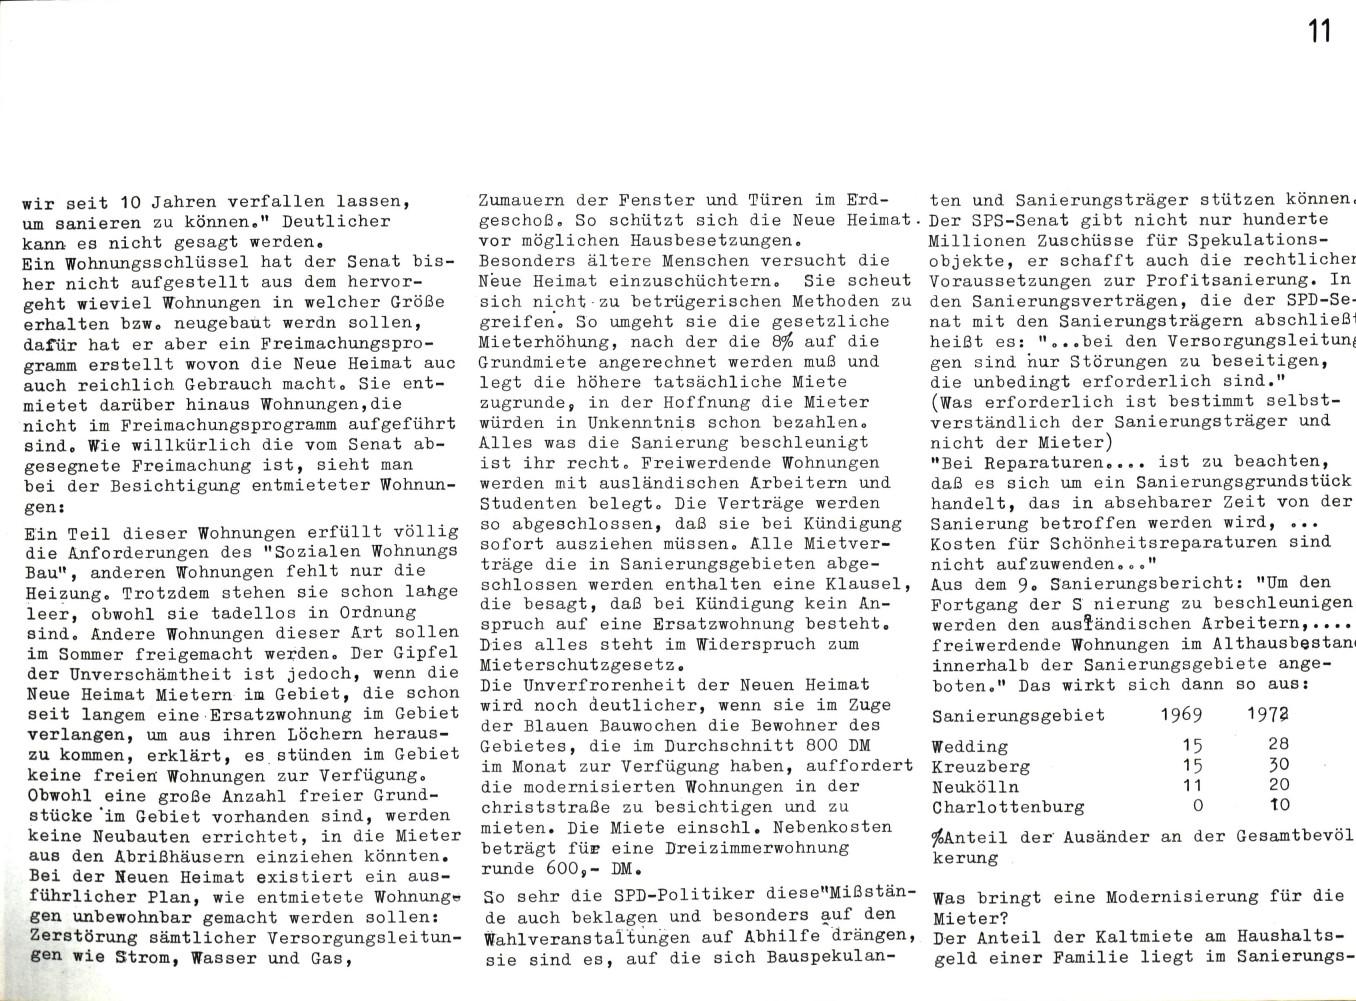 Berlin_KSV_1974_Rote_Bauwochen_19